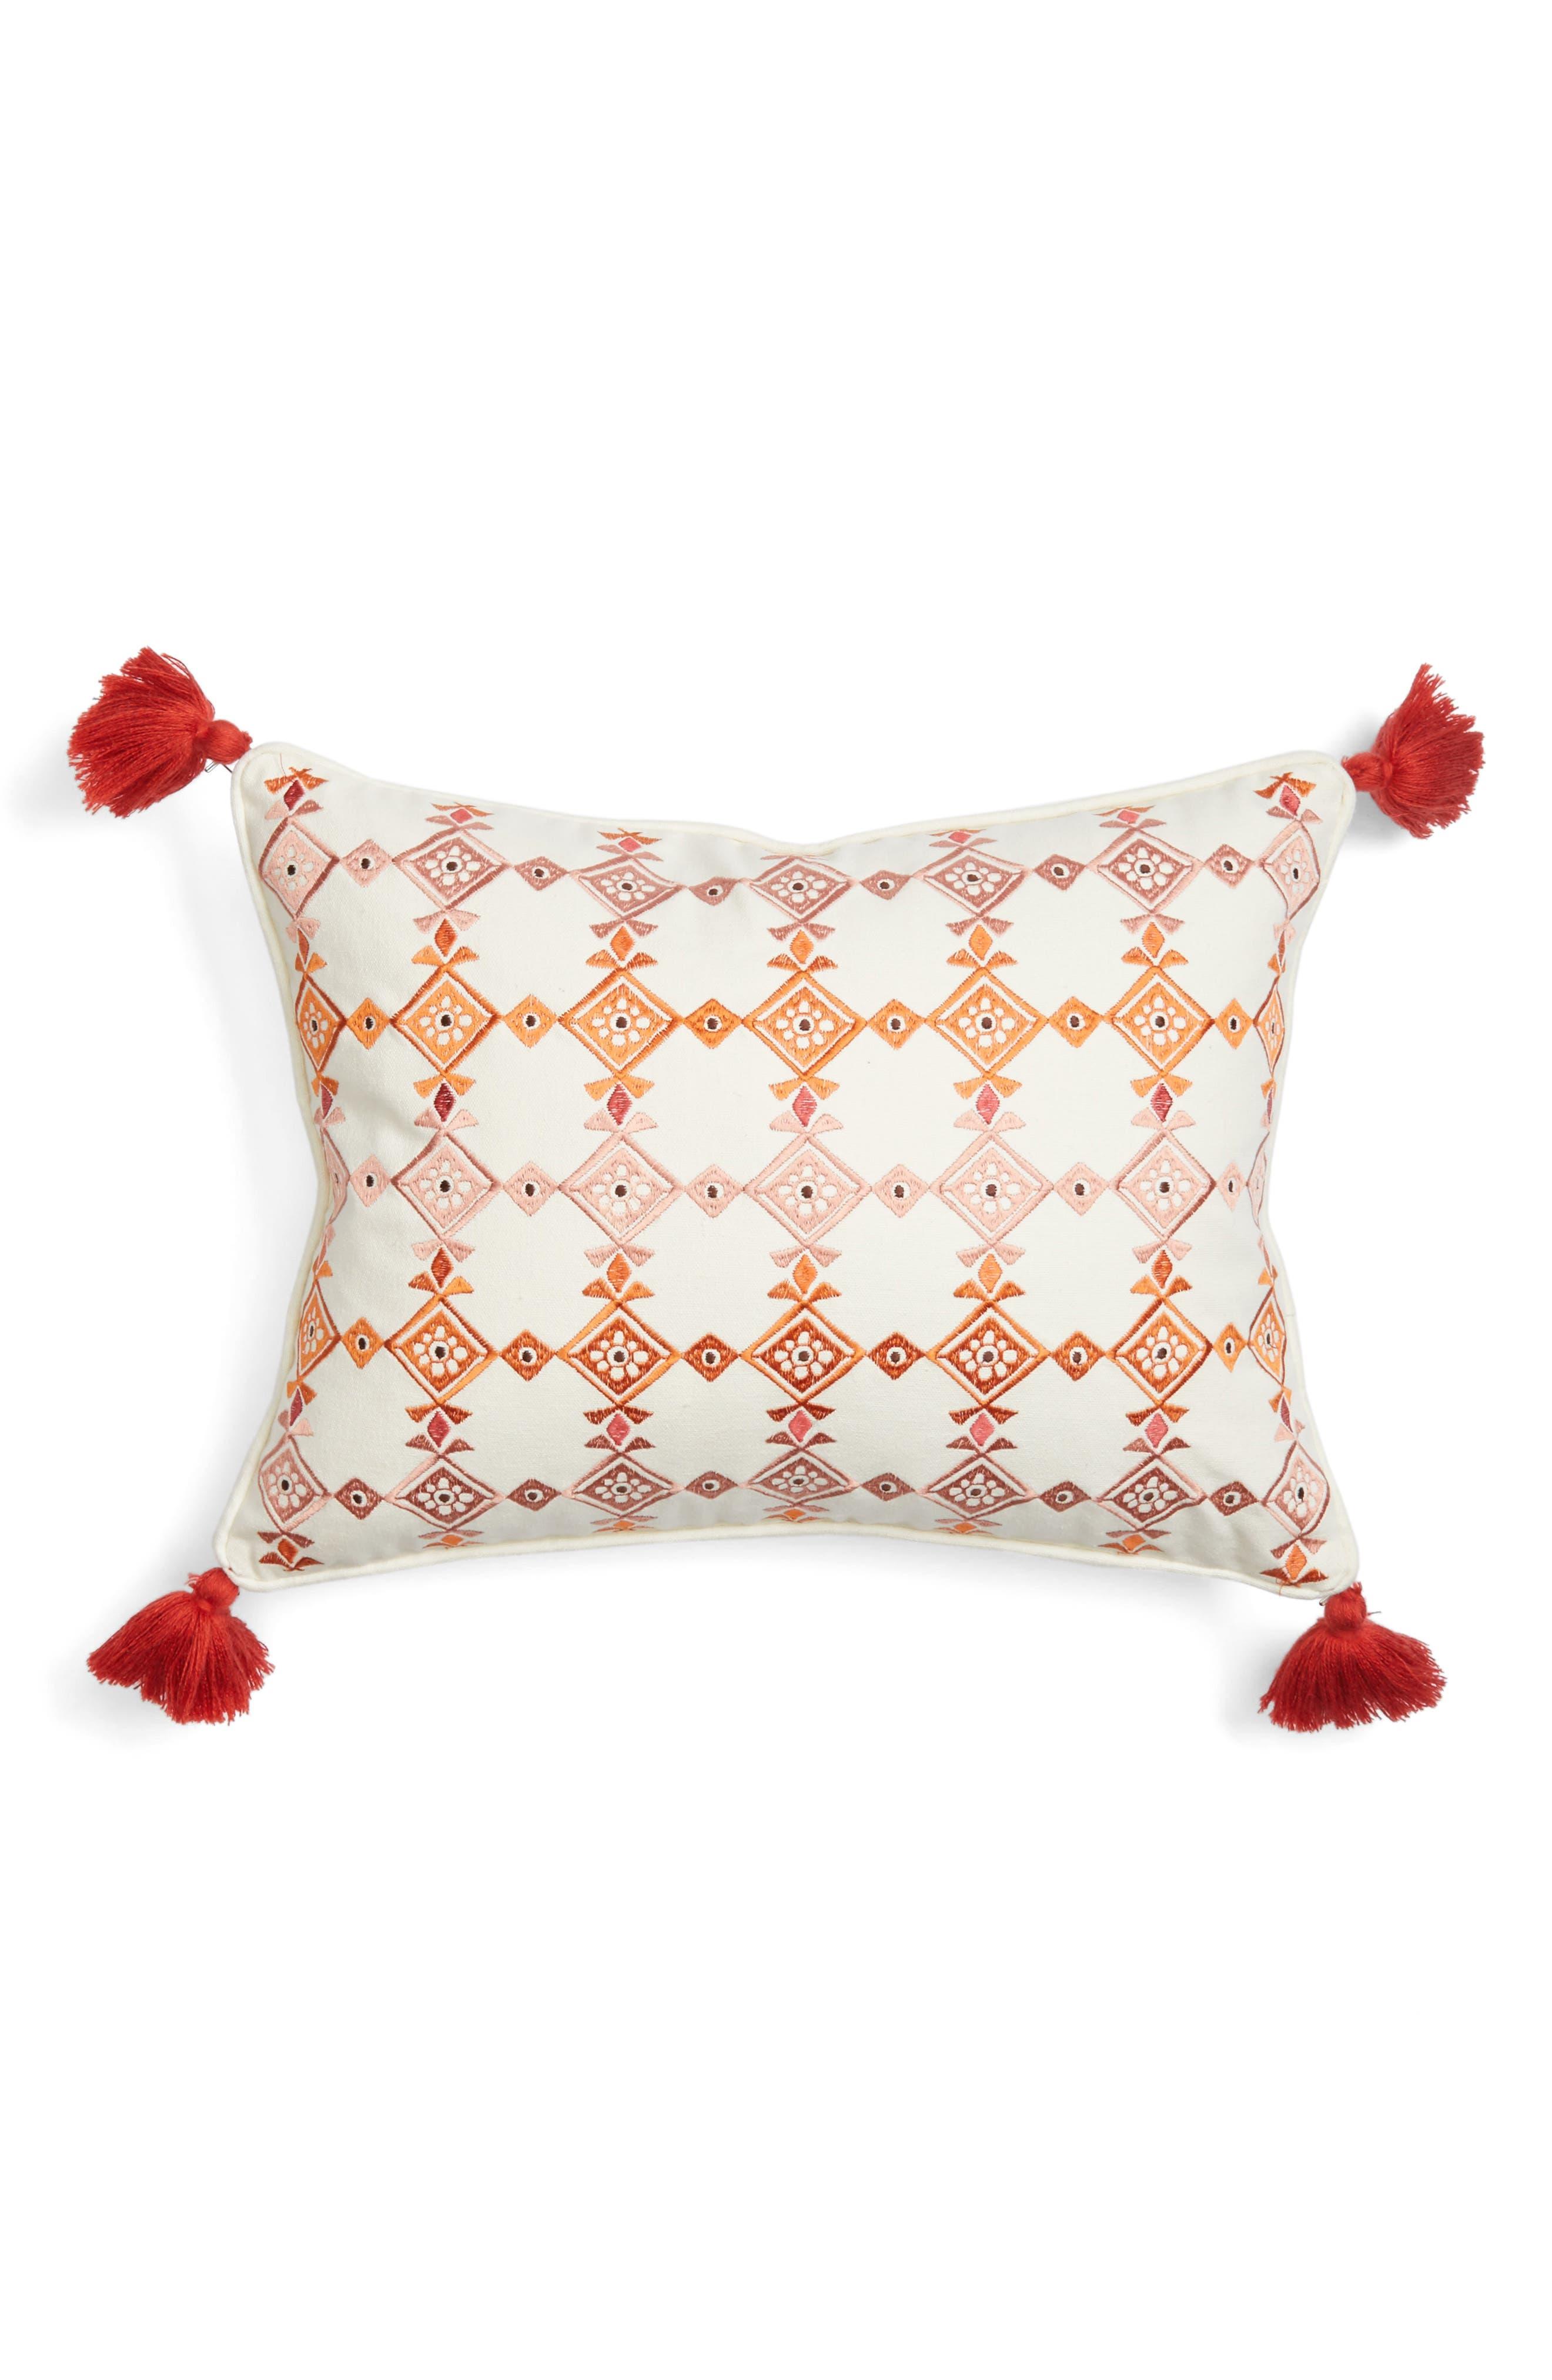 Piper Tassel Pillow,                         Main,                         color,